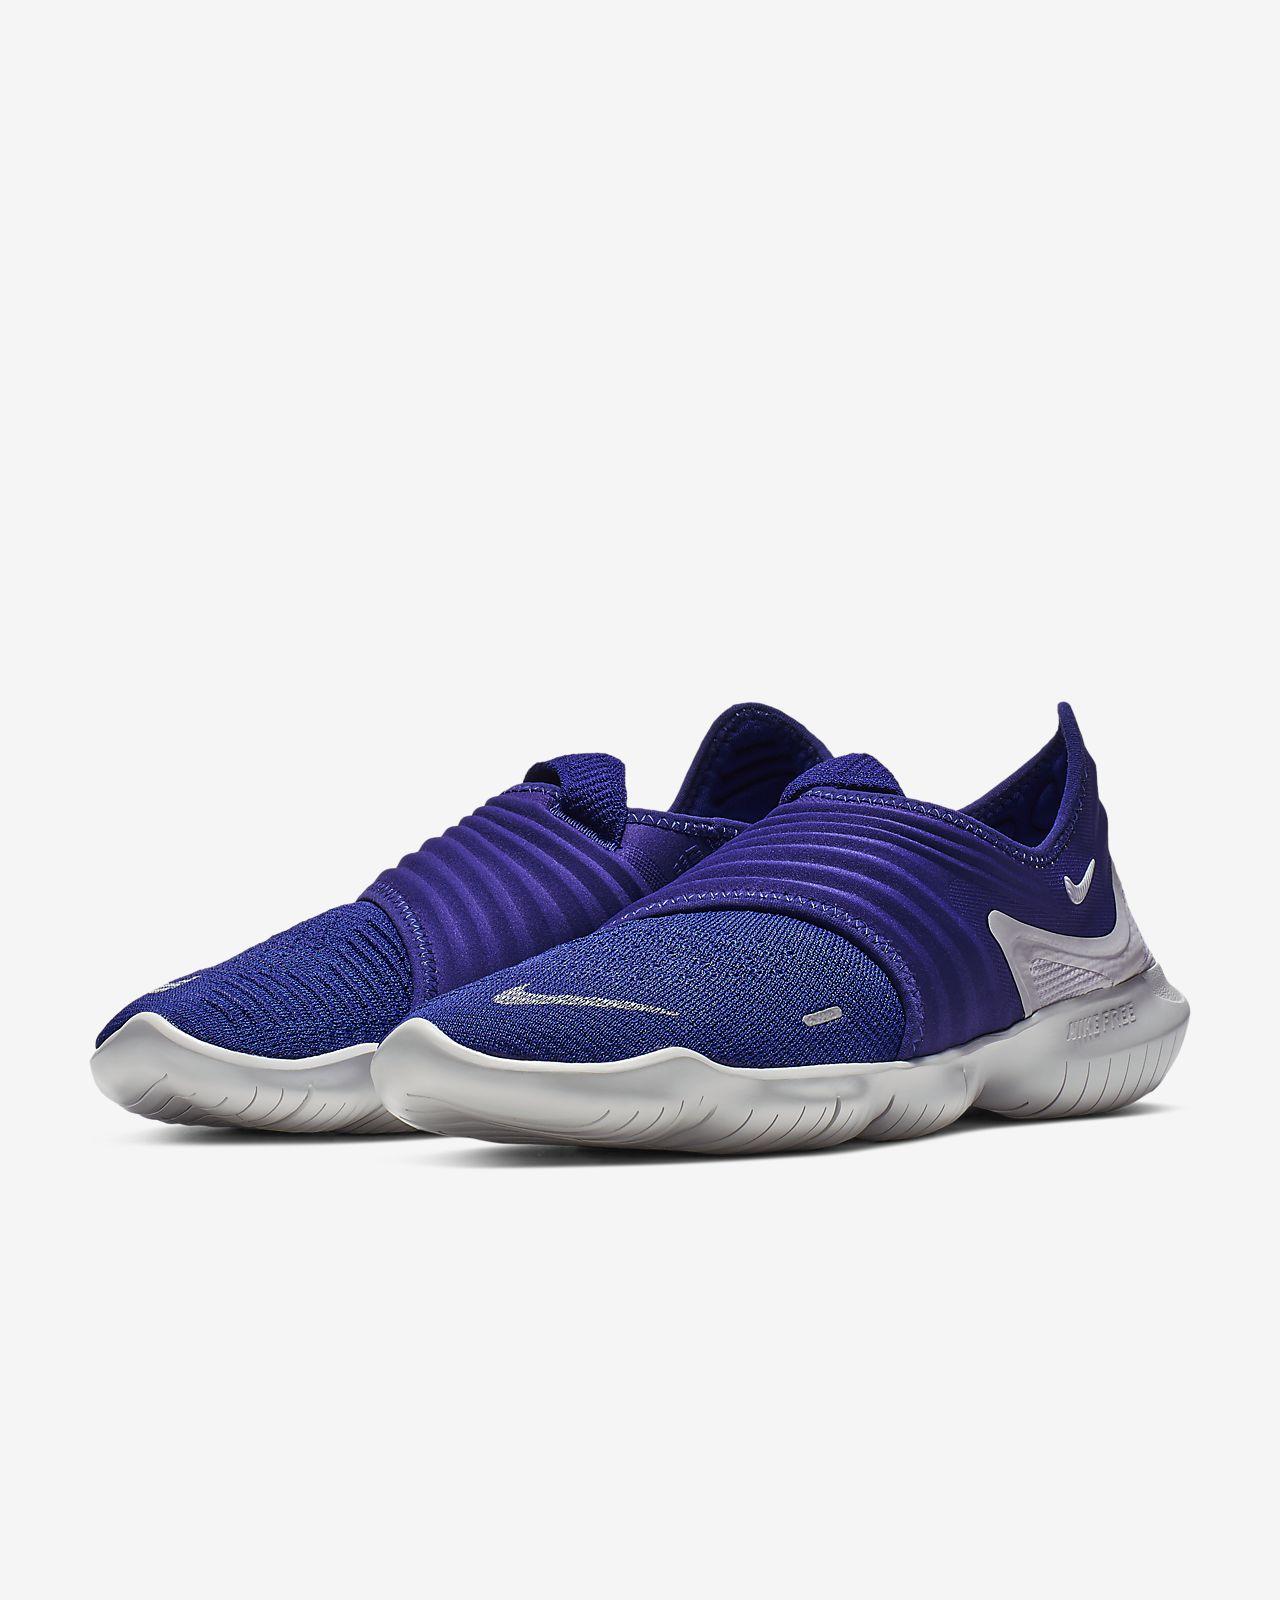 498177259088 Nike Free RN Flyknit 3.0 Men s Running Shoe. Nike.com BE